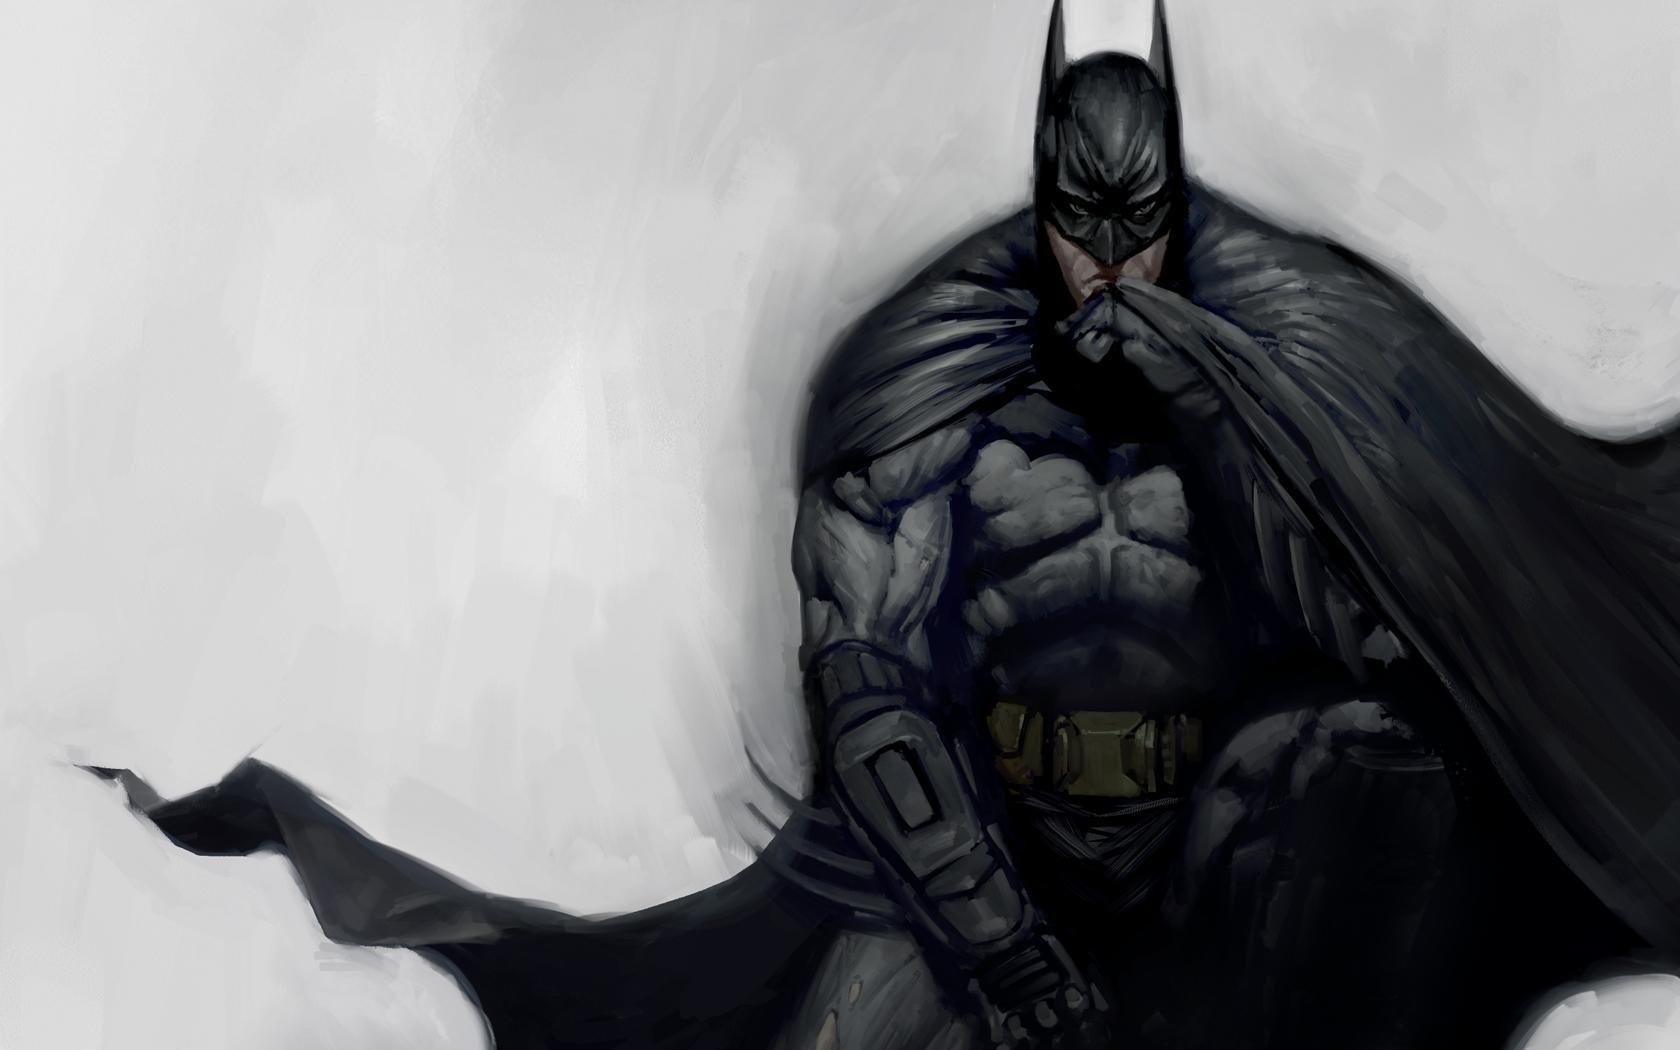 Batman Arkham City Wallpapers 1680x1050 Desktop Backgrounds